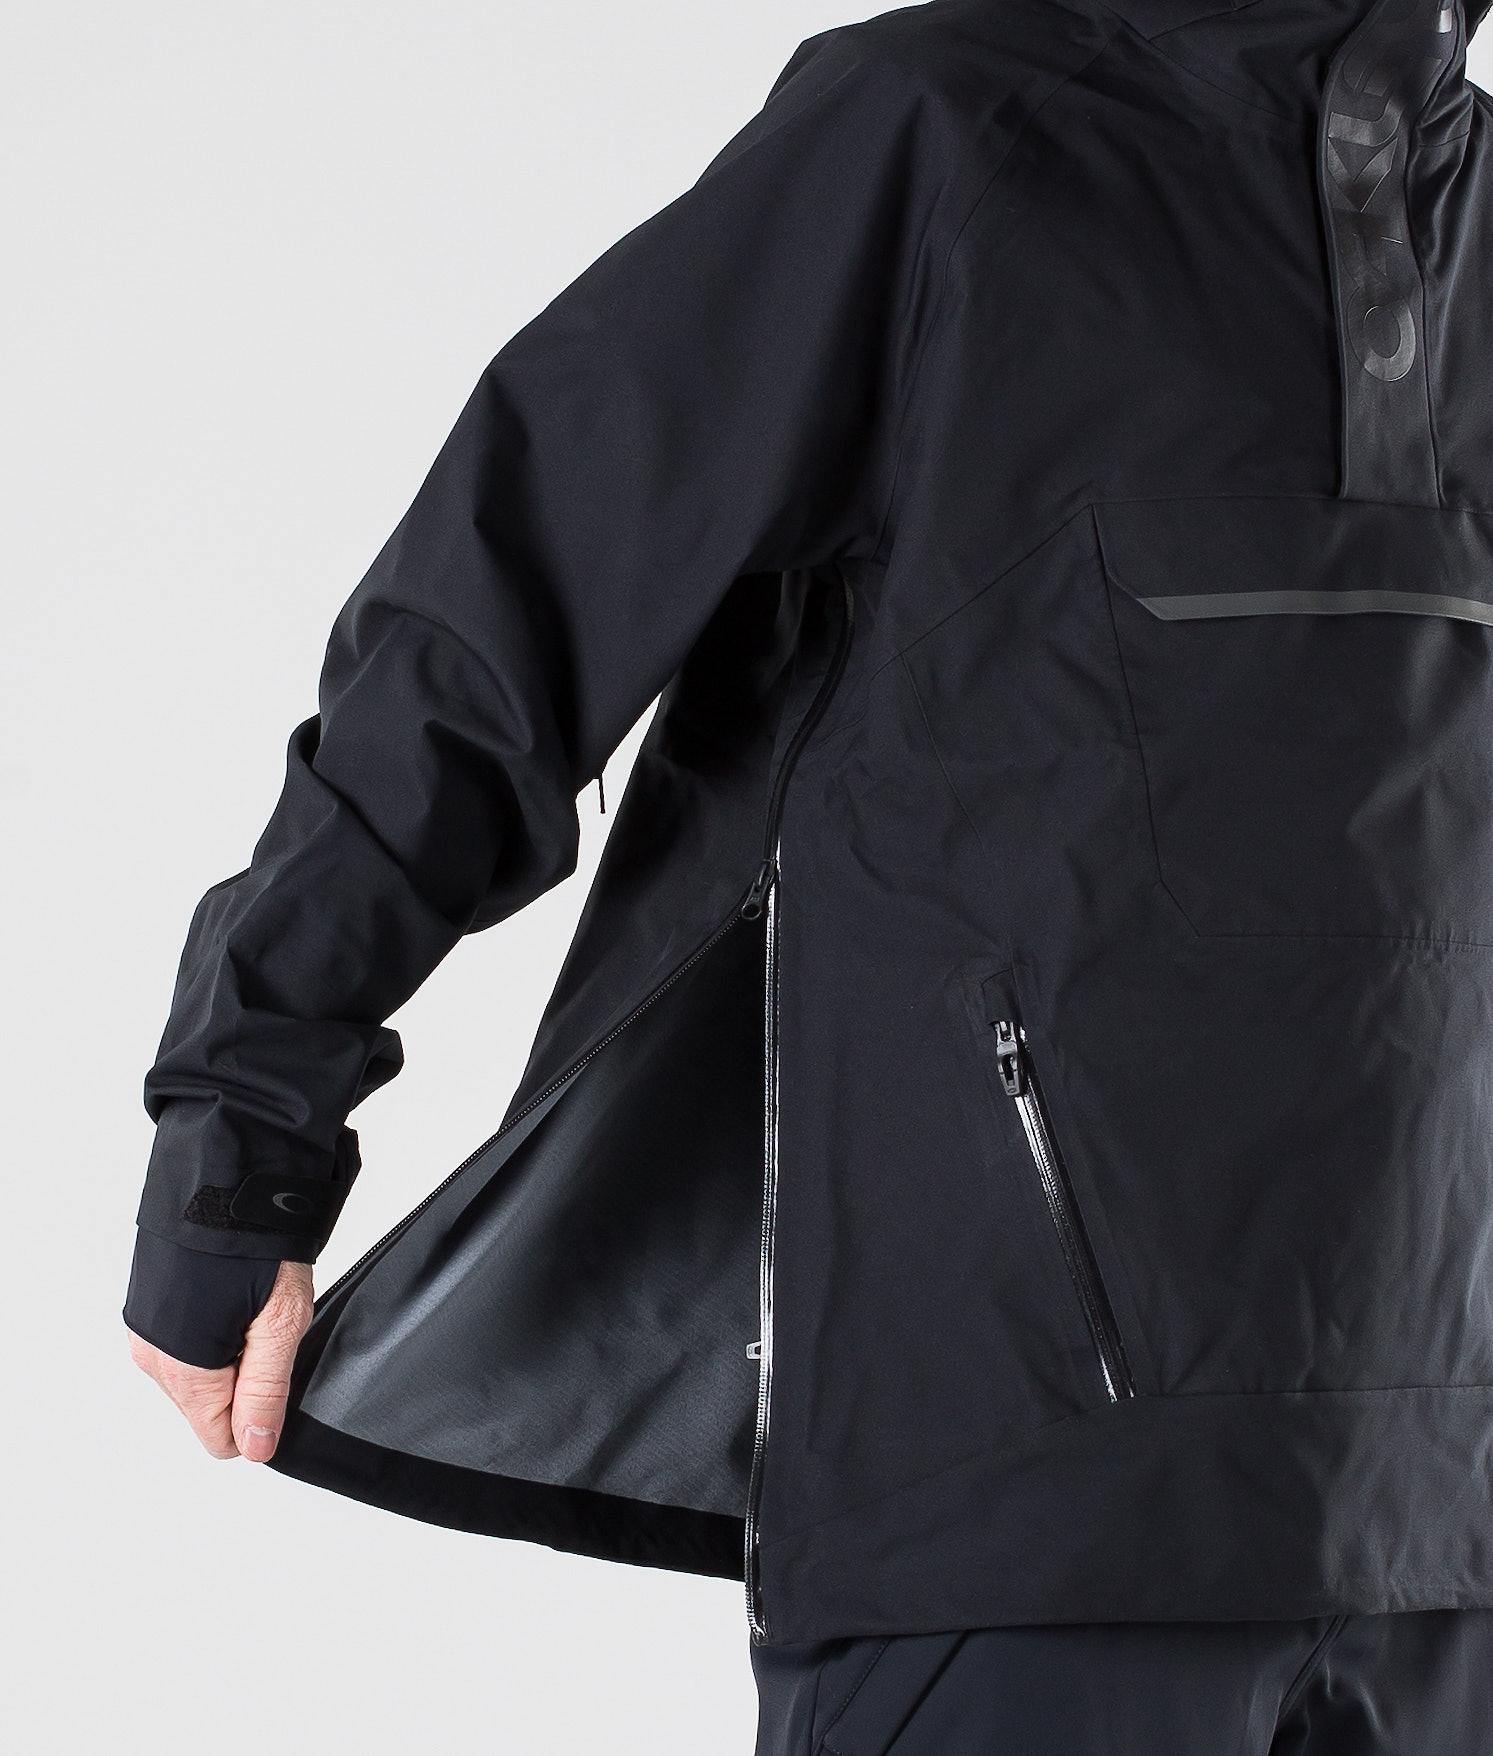 b64d002e6f7 Oakley Snow Shell 10K  2L Anorak Snowboard Jacket Blackout ...